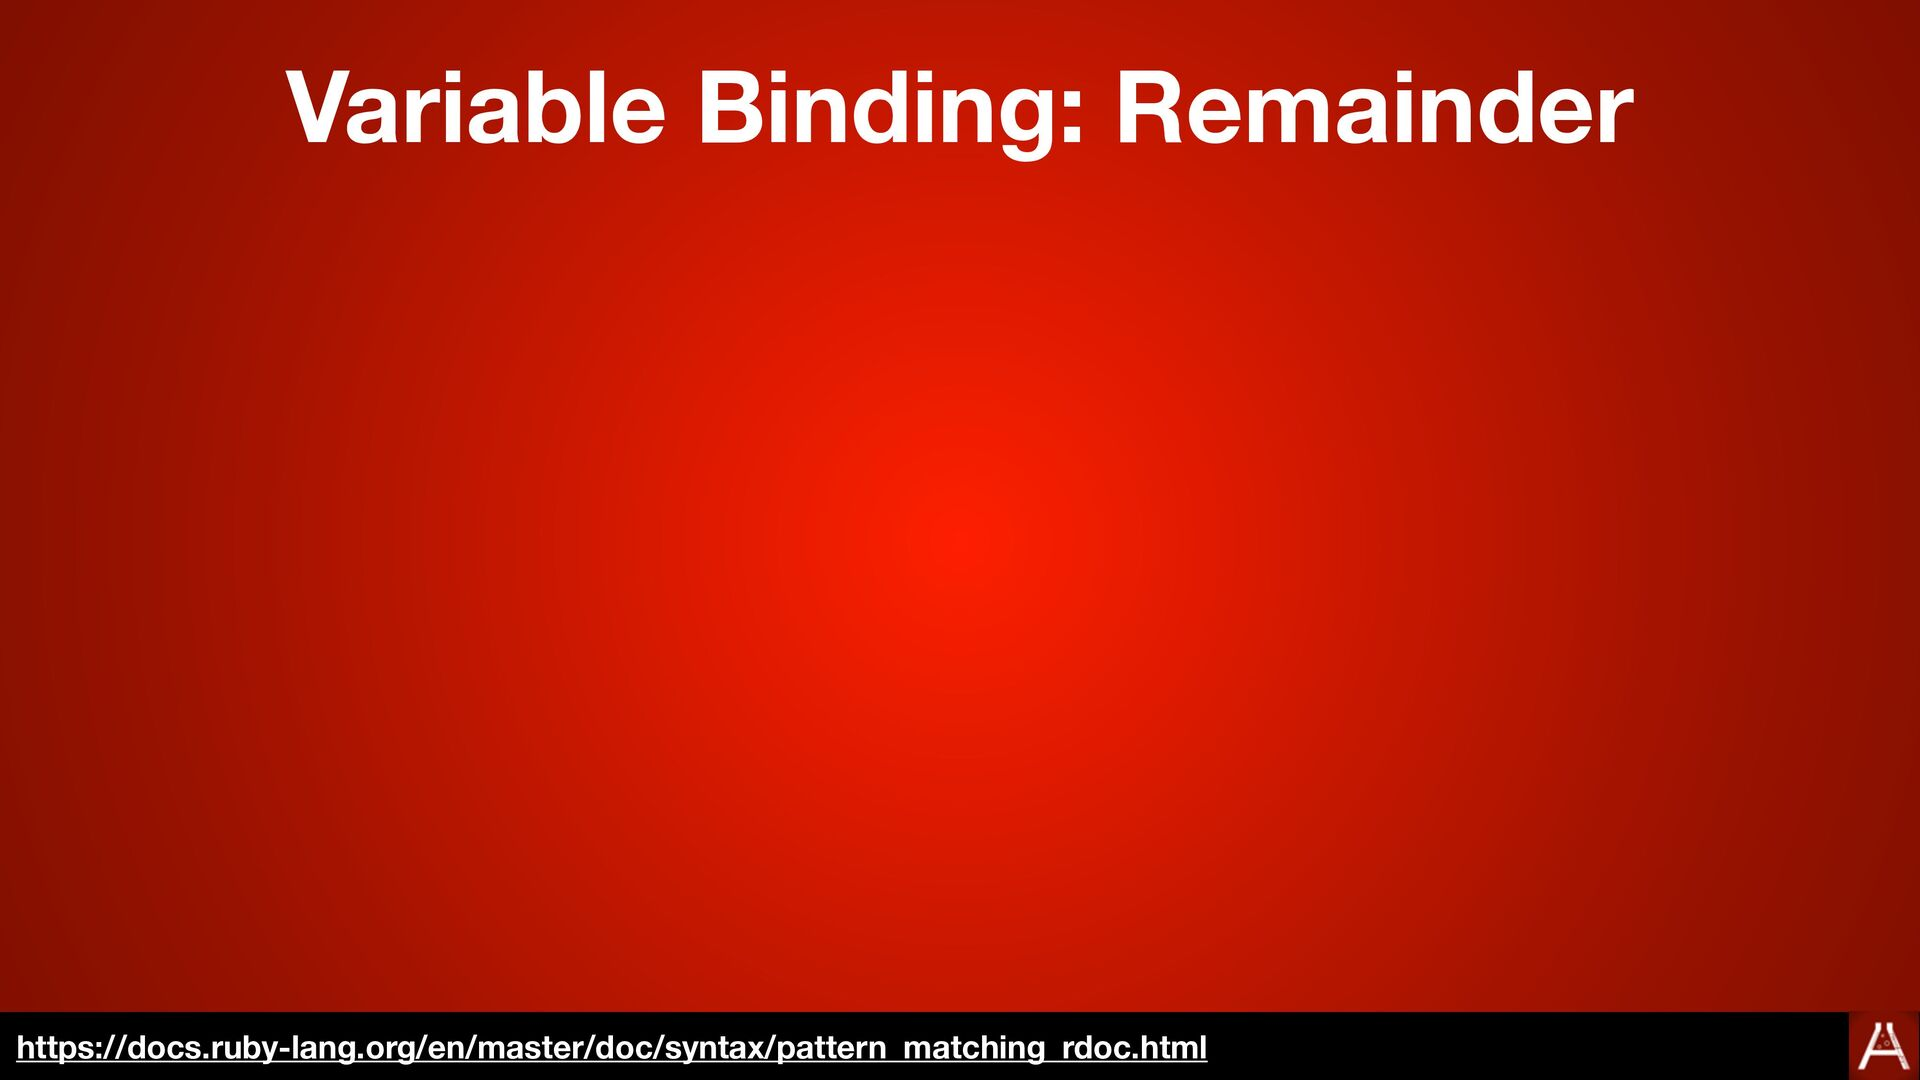 Variable Binding: Remainder https://docs.ruby-l...